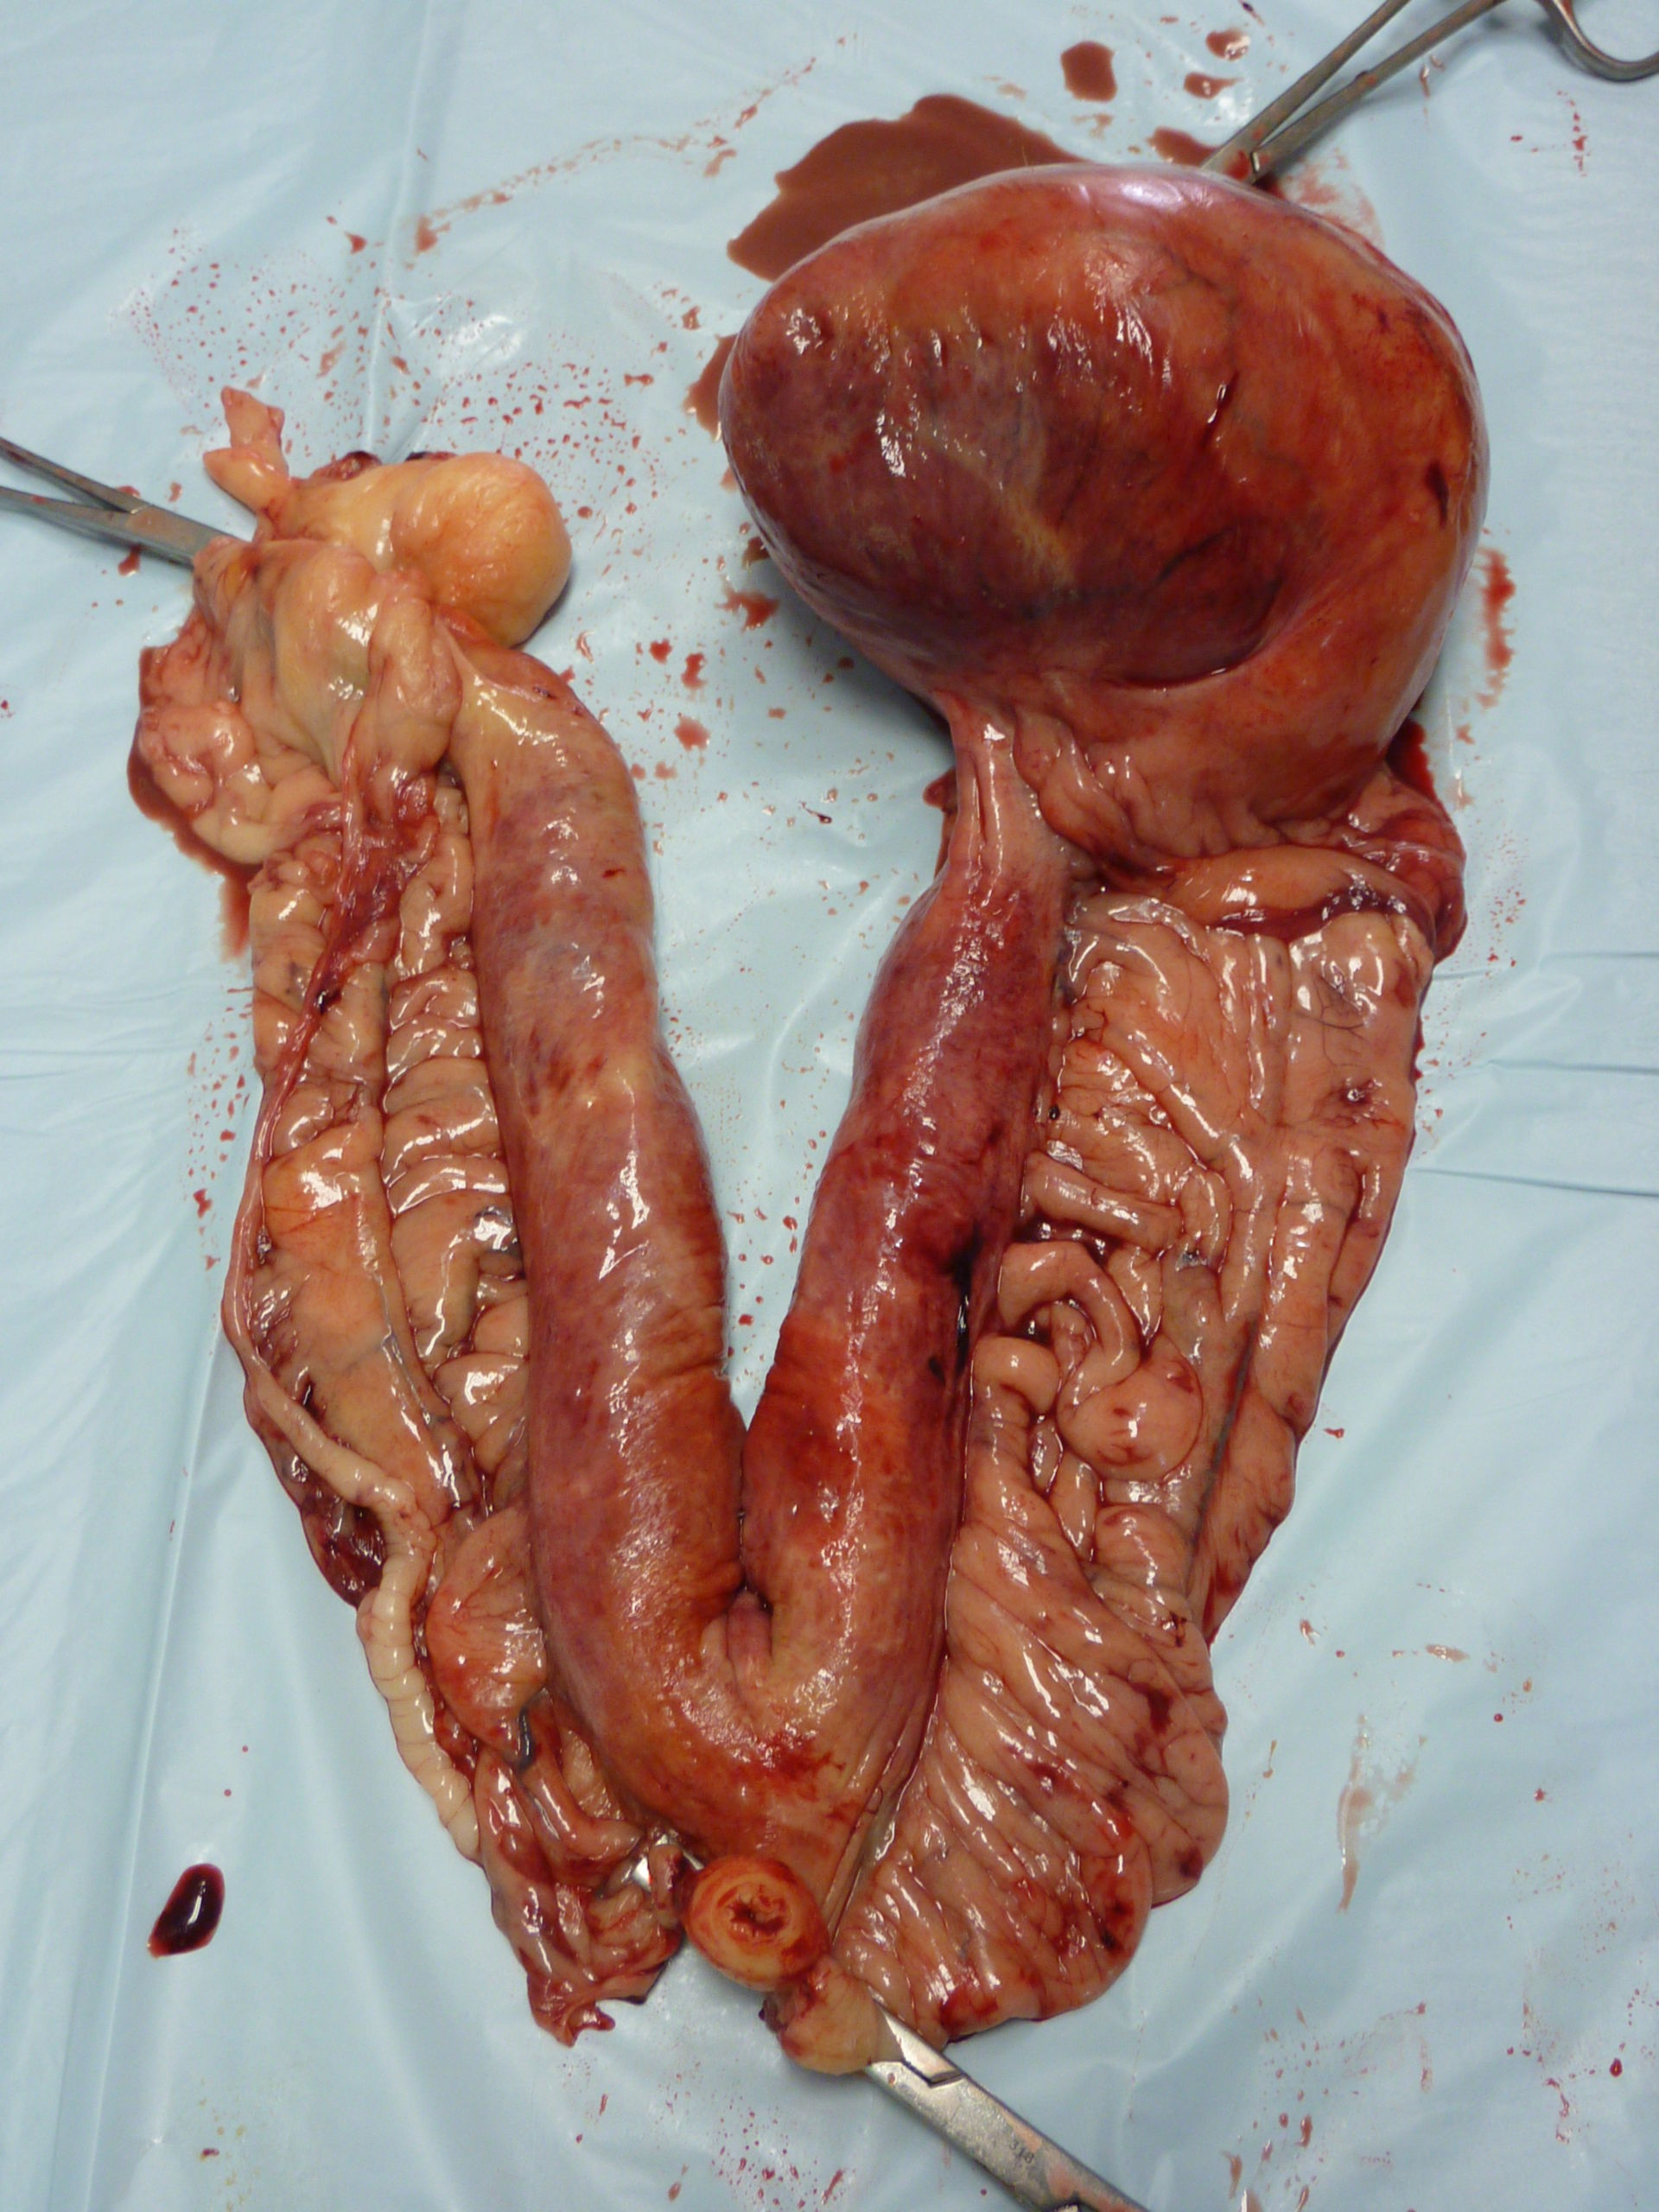 Tumore ovarico e piometra